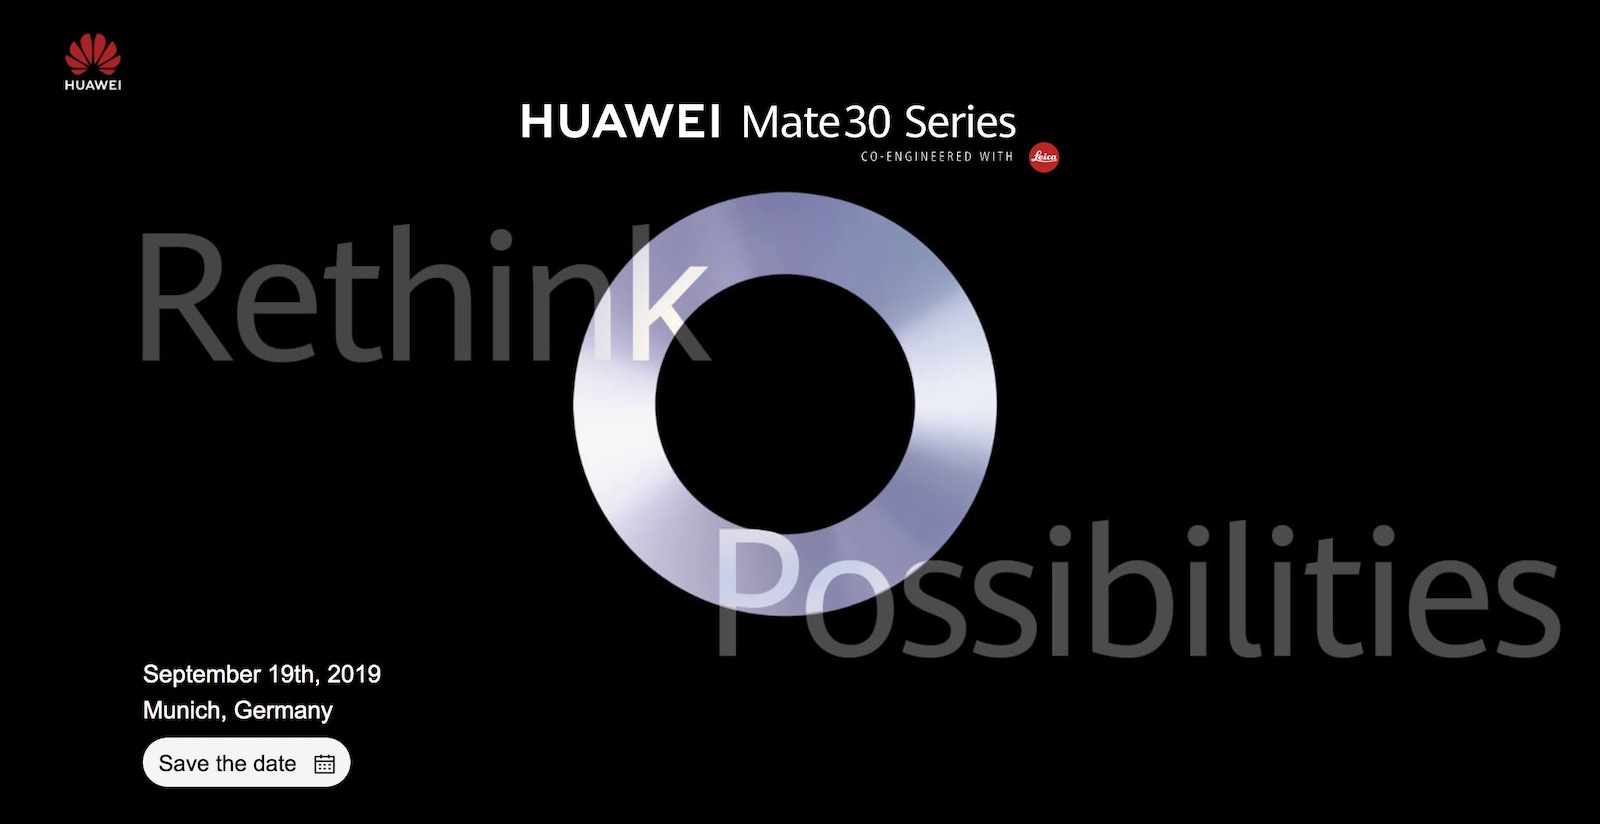 Huawei mate30 event